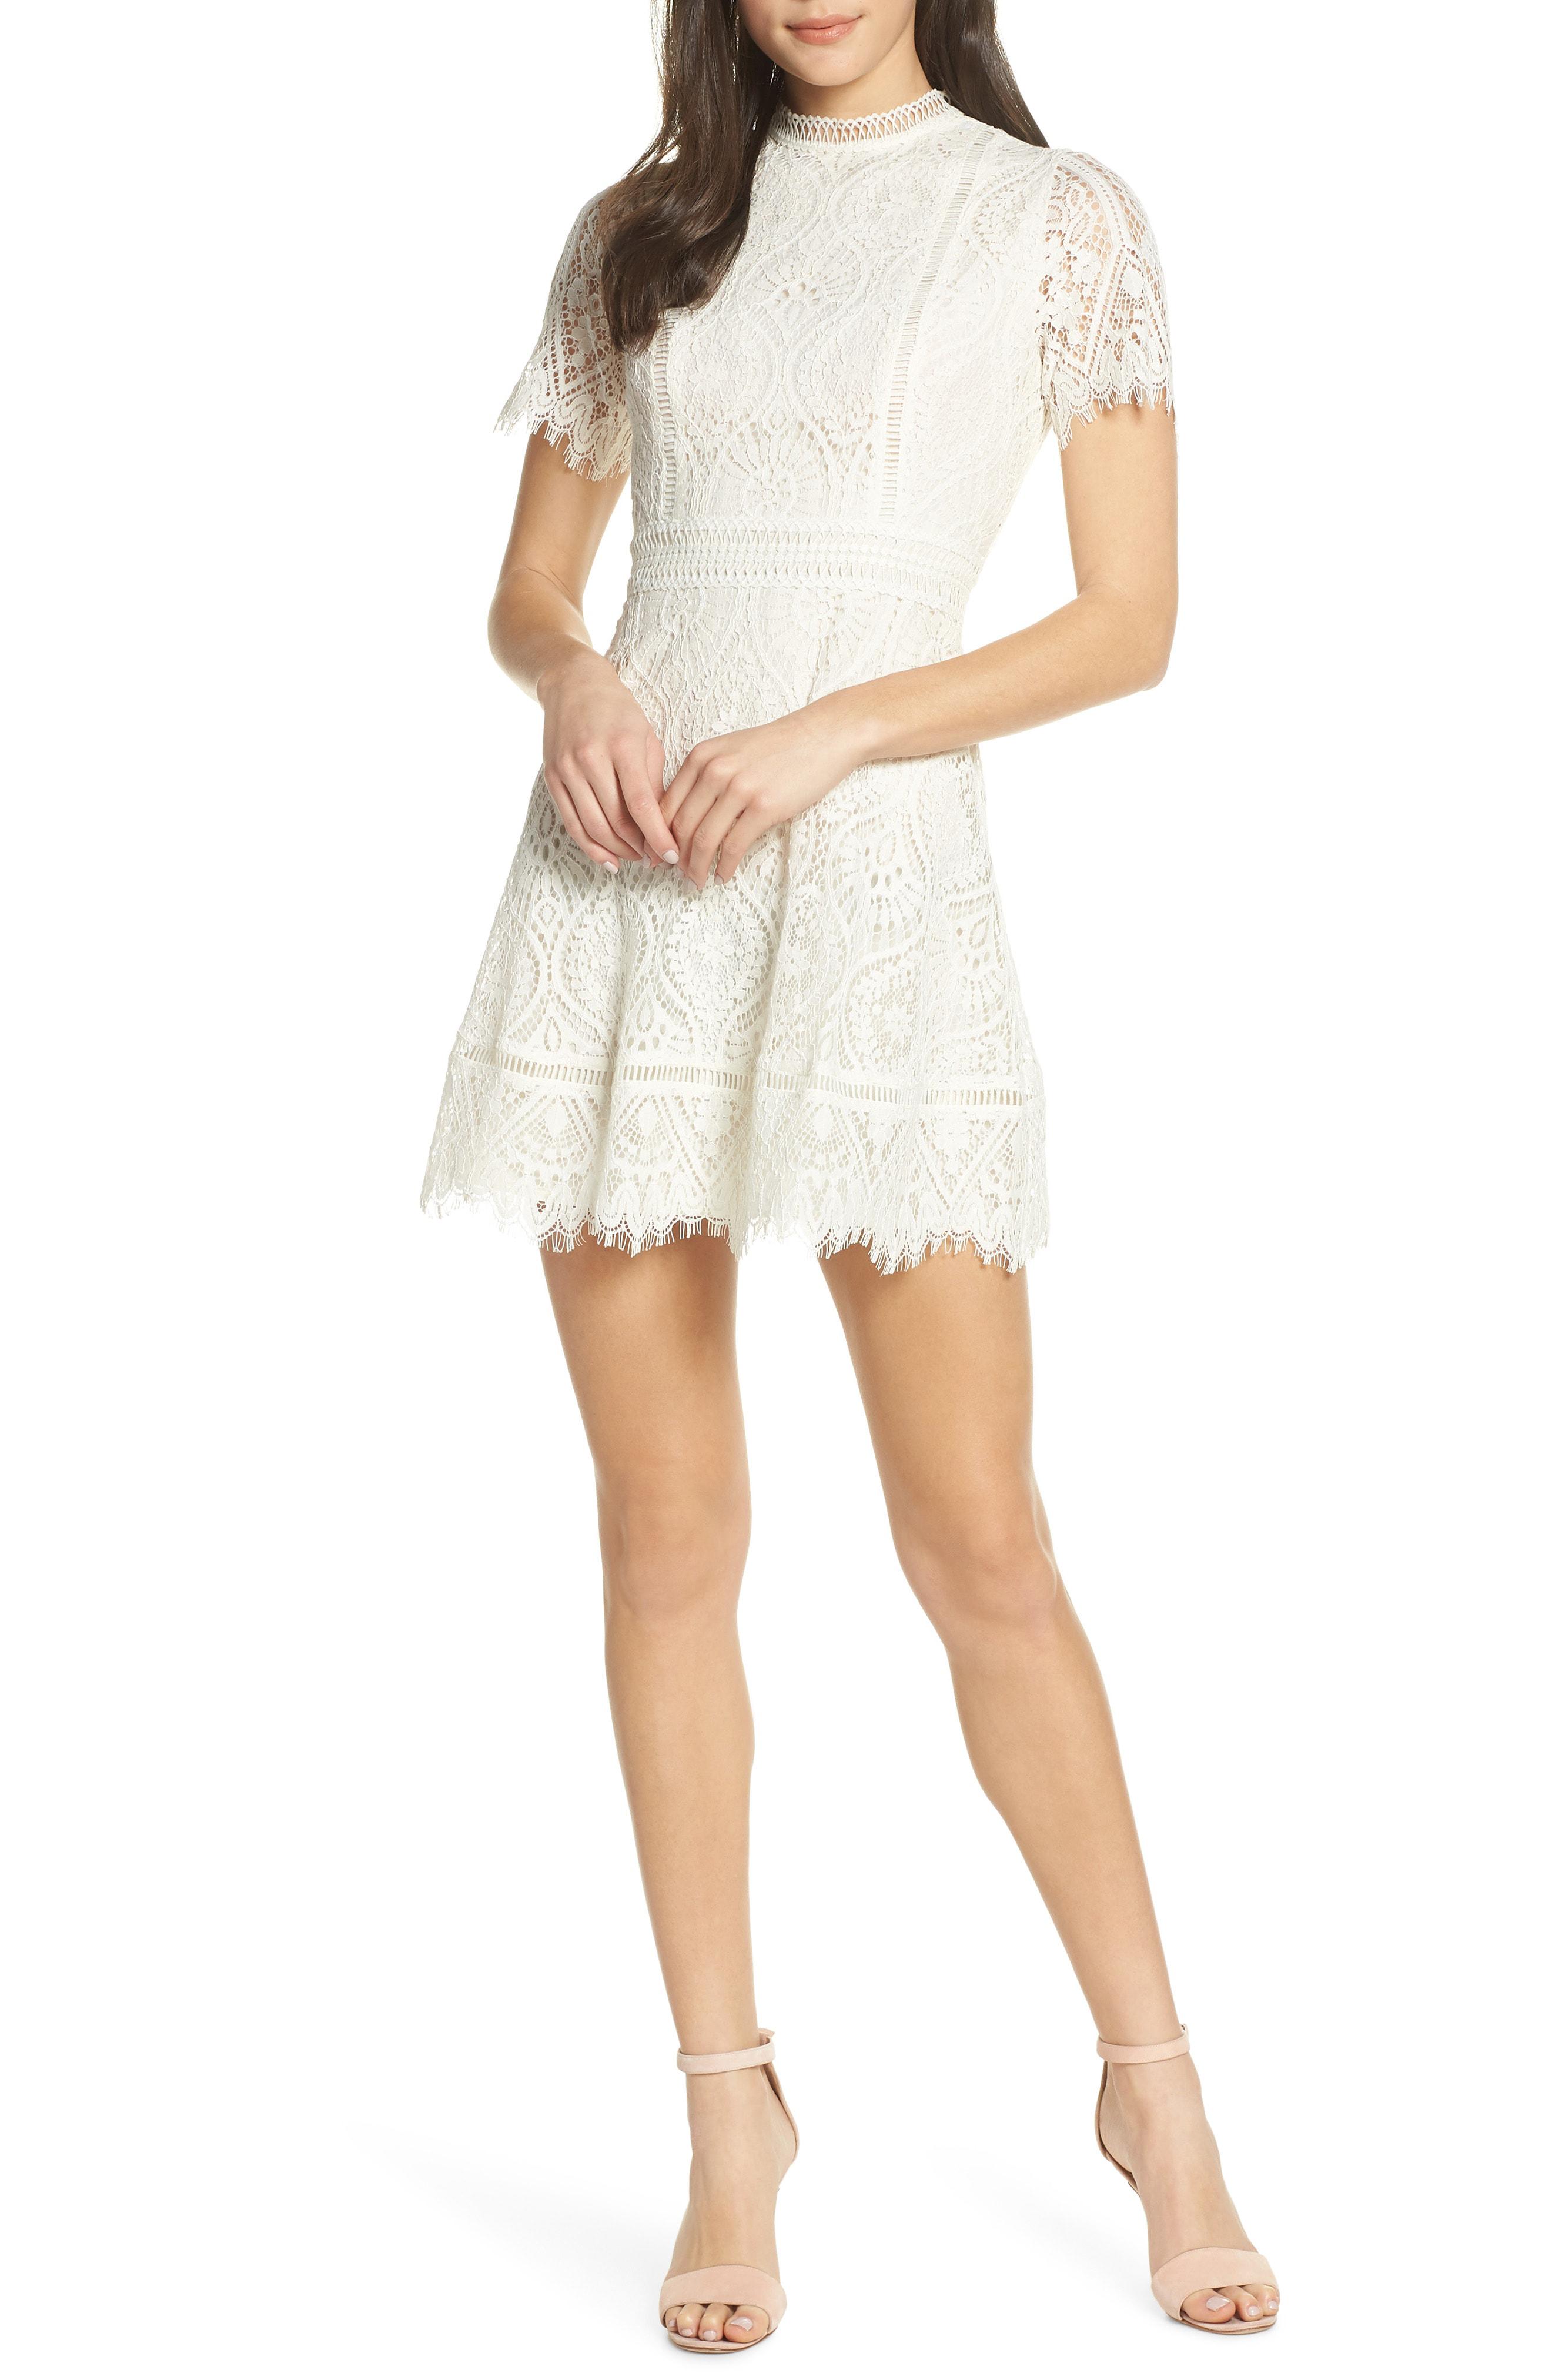 efcf7886eb1 Bb Dakota On List Short Sleeve Lace Fit & Flare Dress In Ivory ...